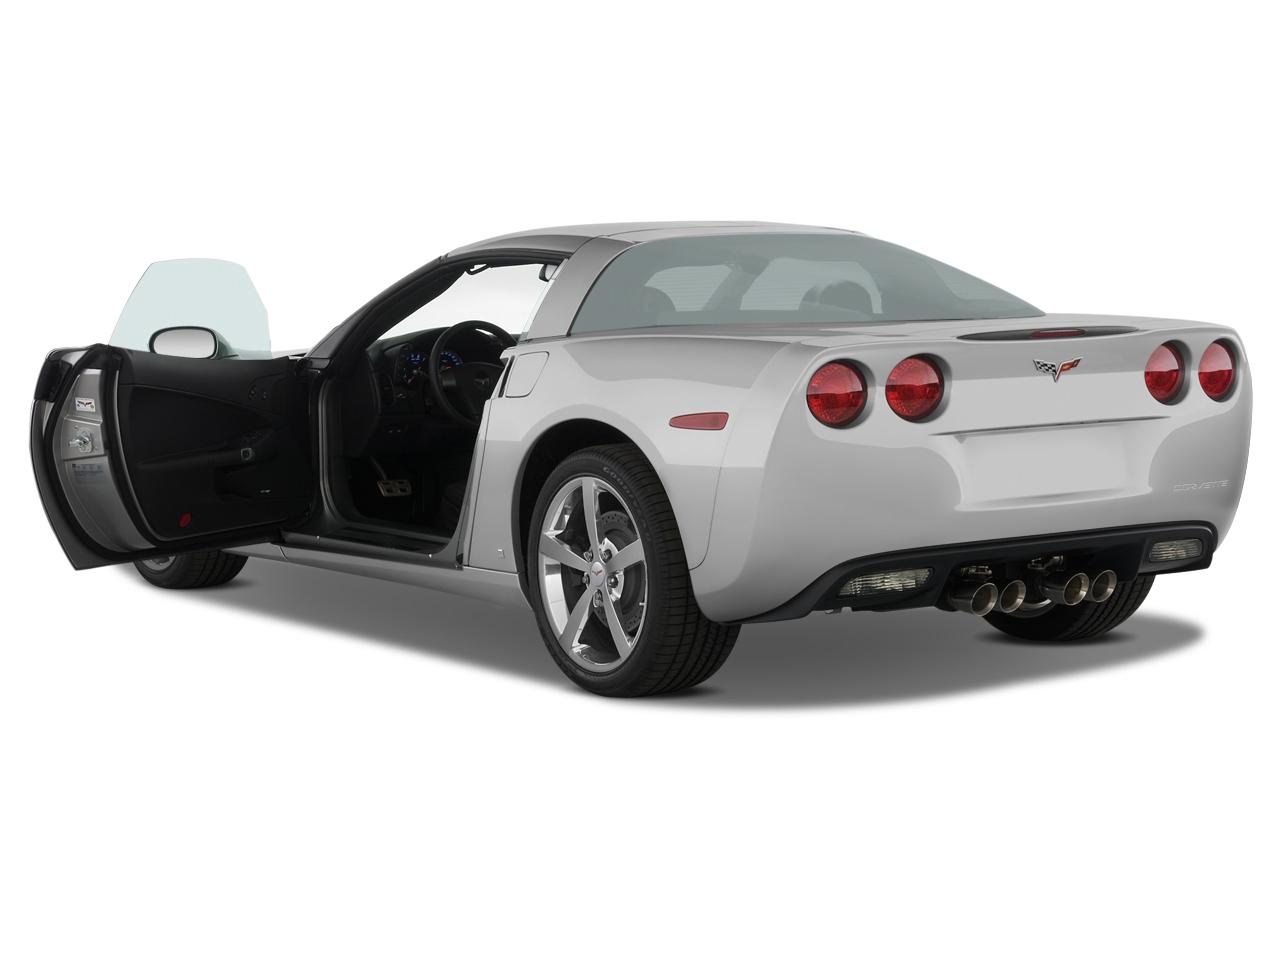 2009 chevrolet corvette zr1 blown away automobile magazine. Black Bedroom Furniture Sets. Home Design Ideas